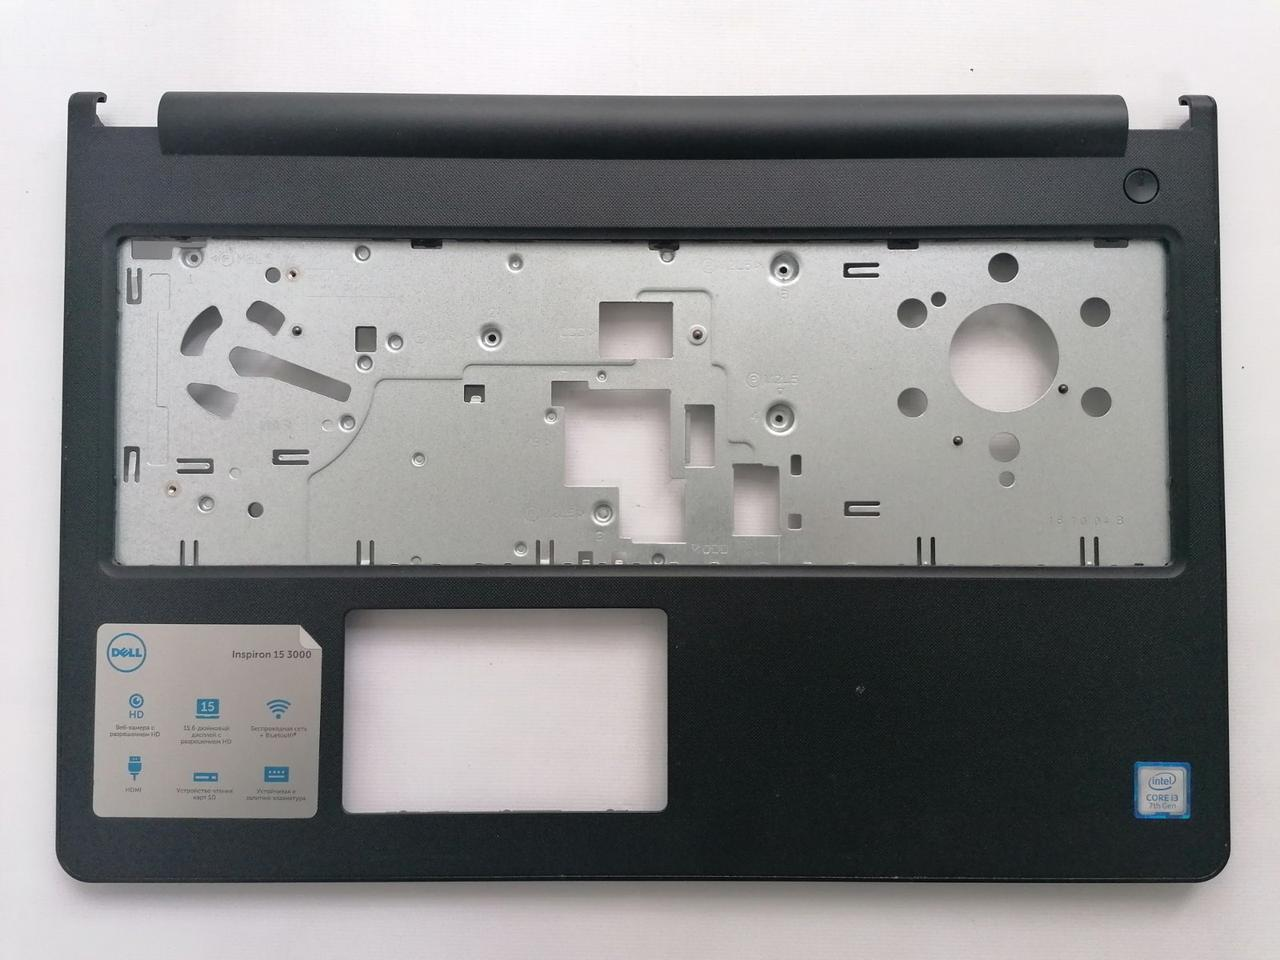 Б/У корпус крышка клавиатуры (топкейс) для  Dell Inspiron 15-3000 3565 3567 ( 04F55W )